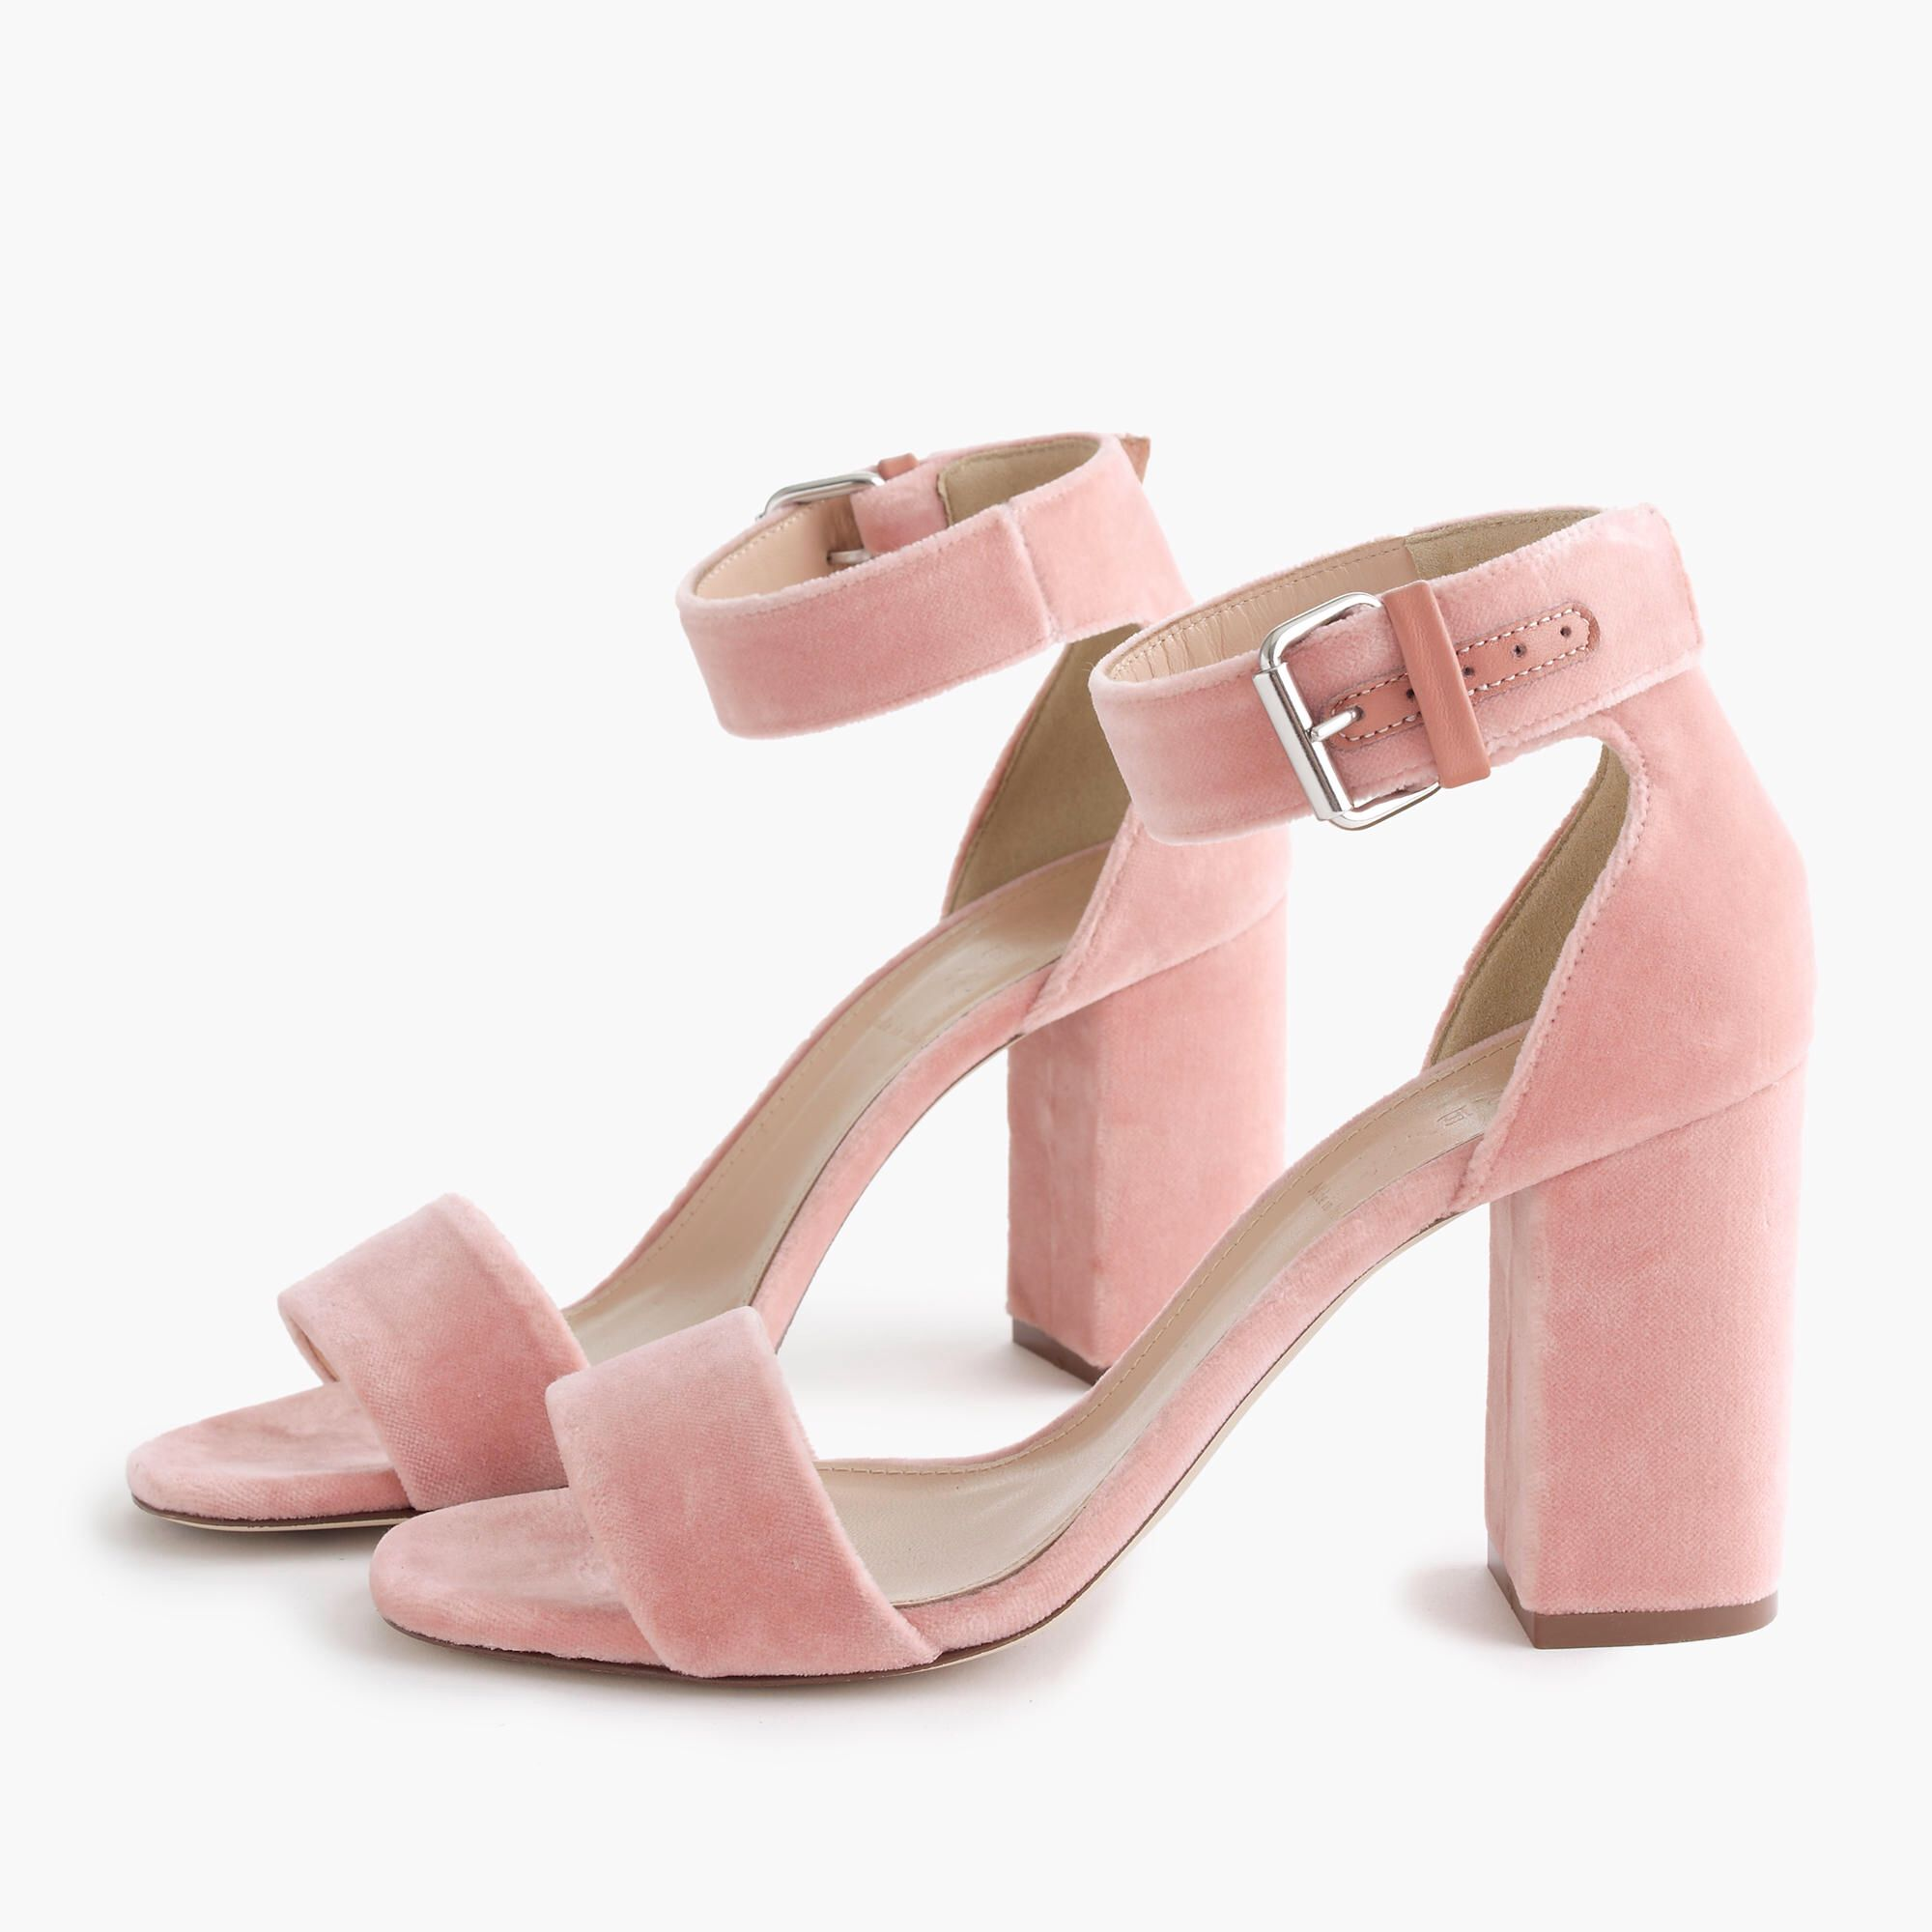 Cream Flat Shoes Womens